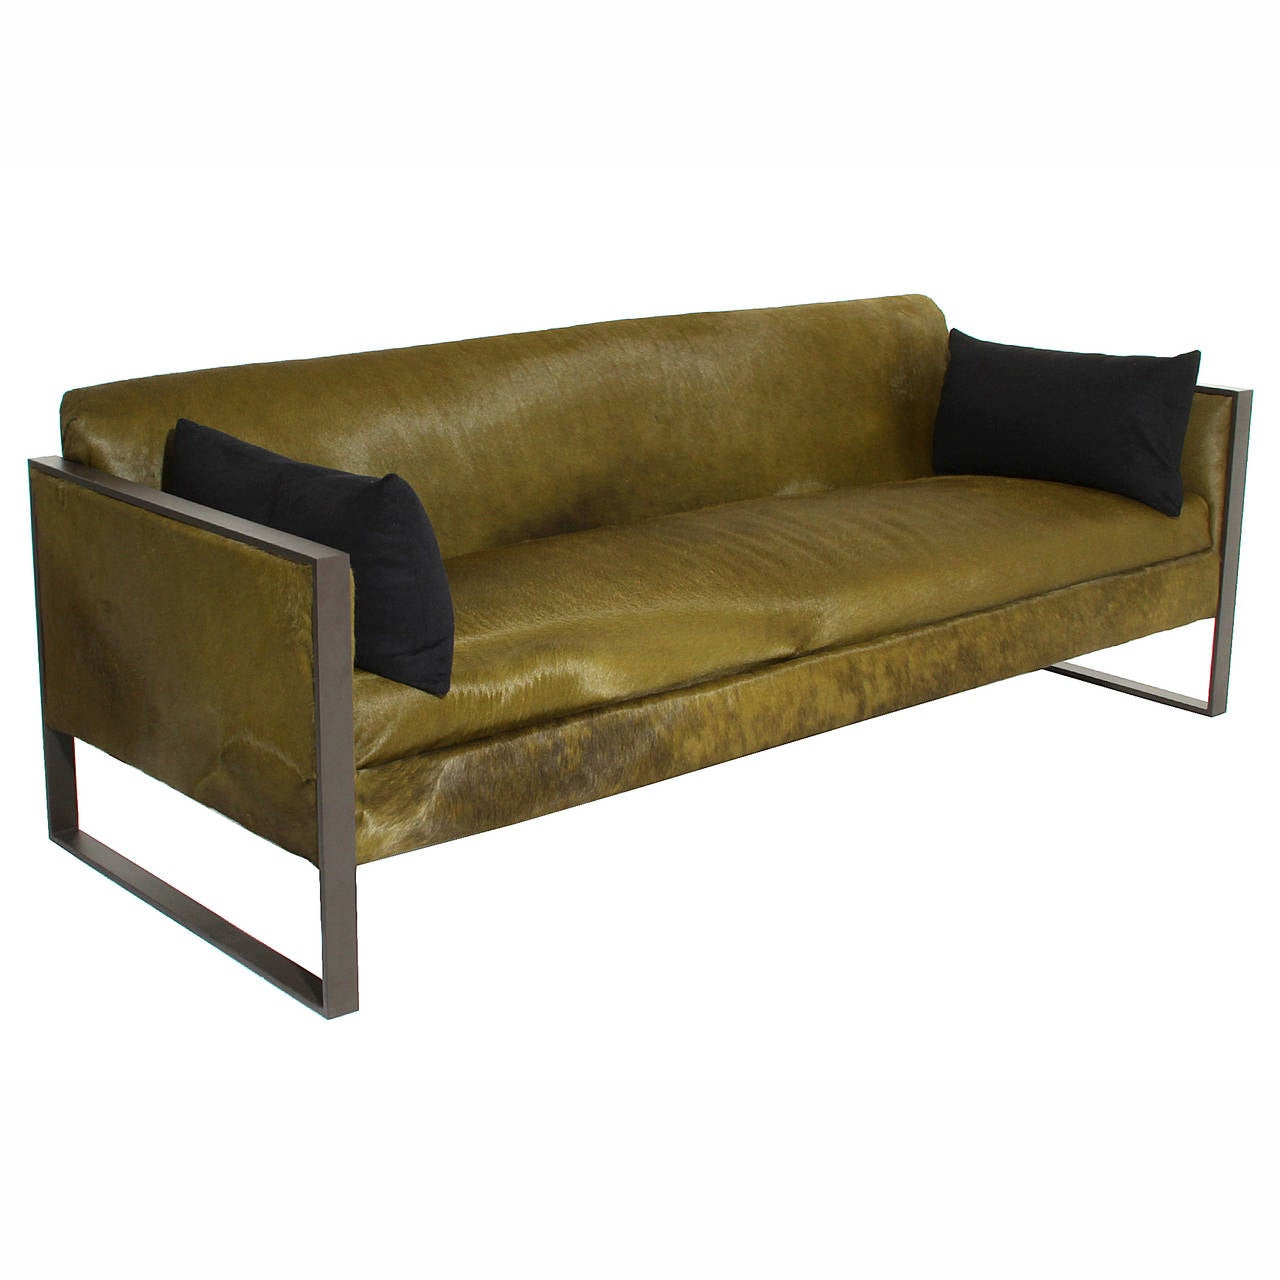 Sectional Sofa Olive Green: Milo Baughman Steel Flat Bar Sofa In Olive Green Pony Hair